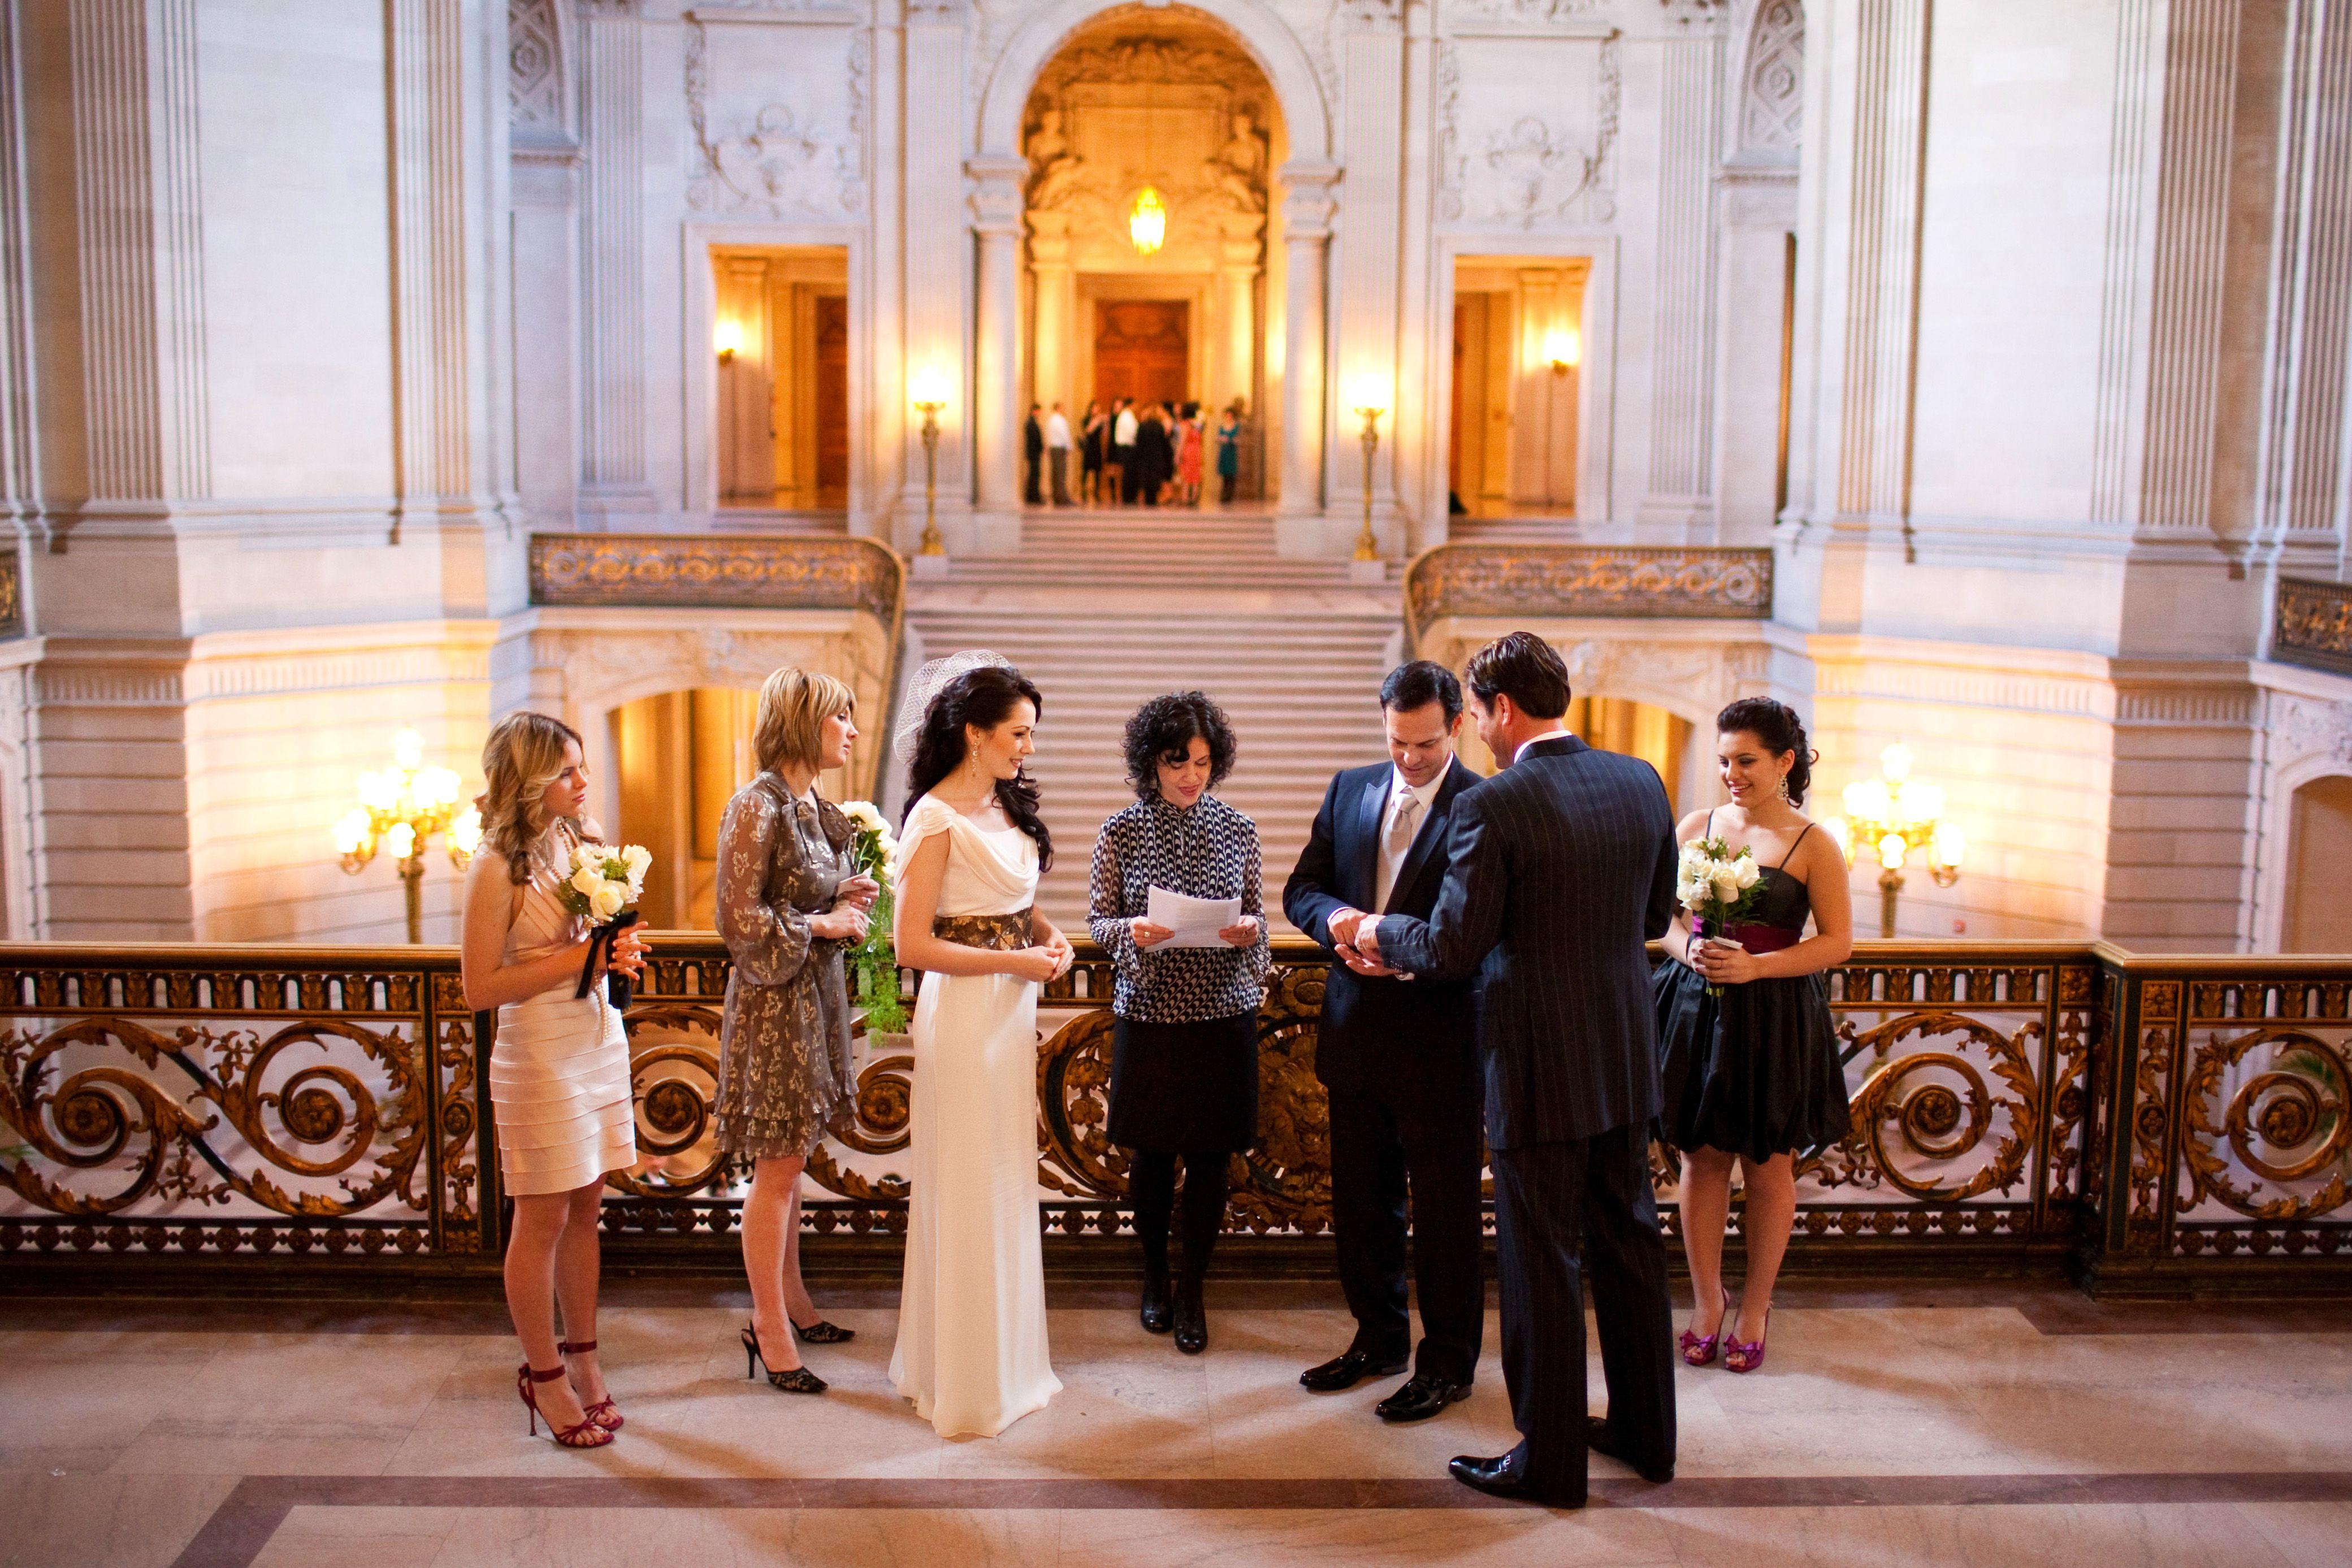 Mayer S Balcony Wedding Ceremony At San Francisco City Hall San Francisco City Hall San Francisco City Hall Wedding Sf City Hall Wedding